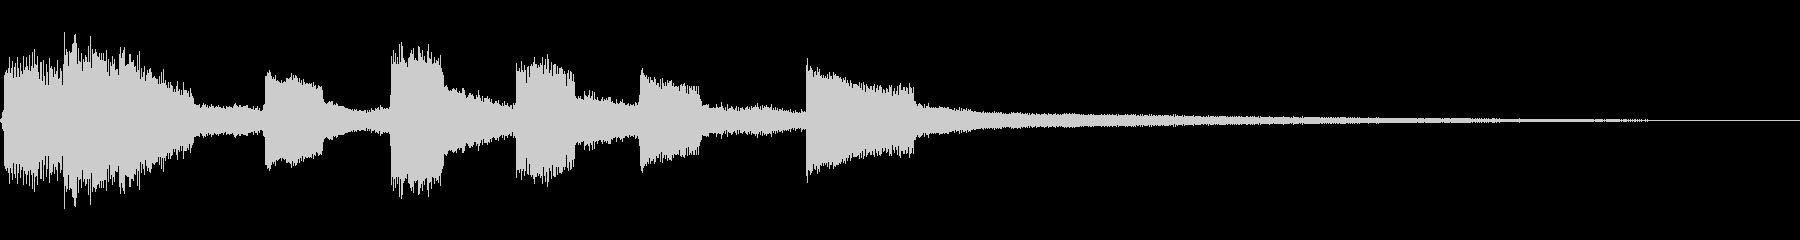 Bell-ジングル_01の未再生の波形